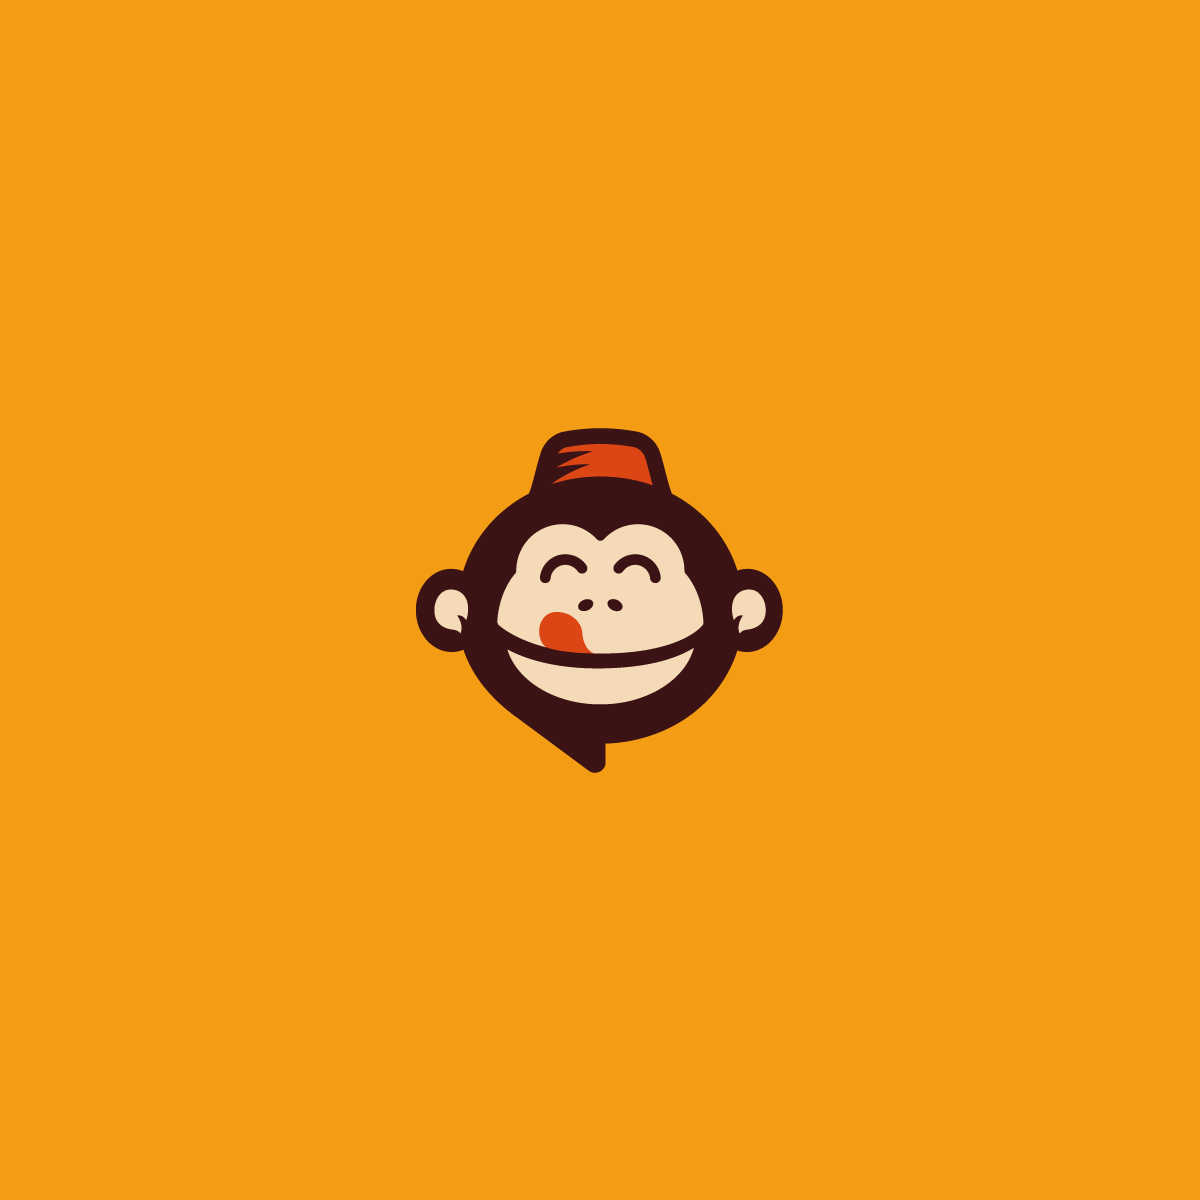 Monchies-logo-vaslam